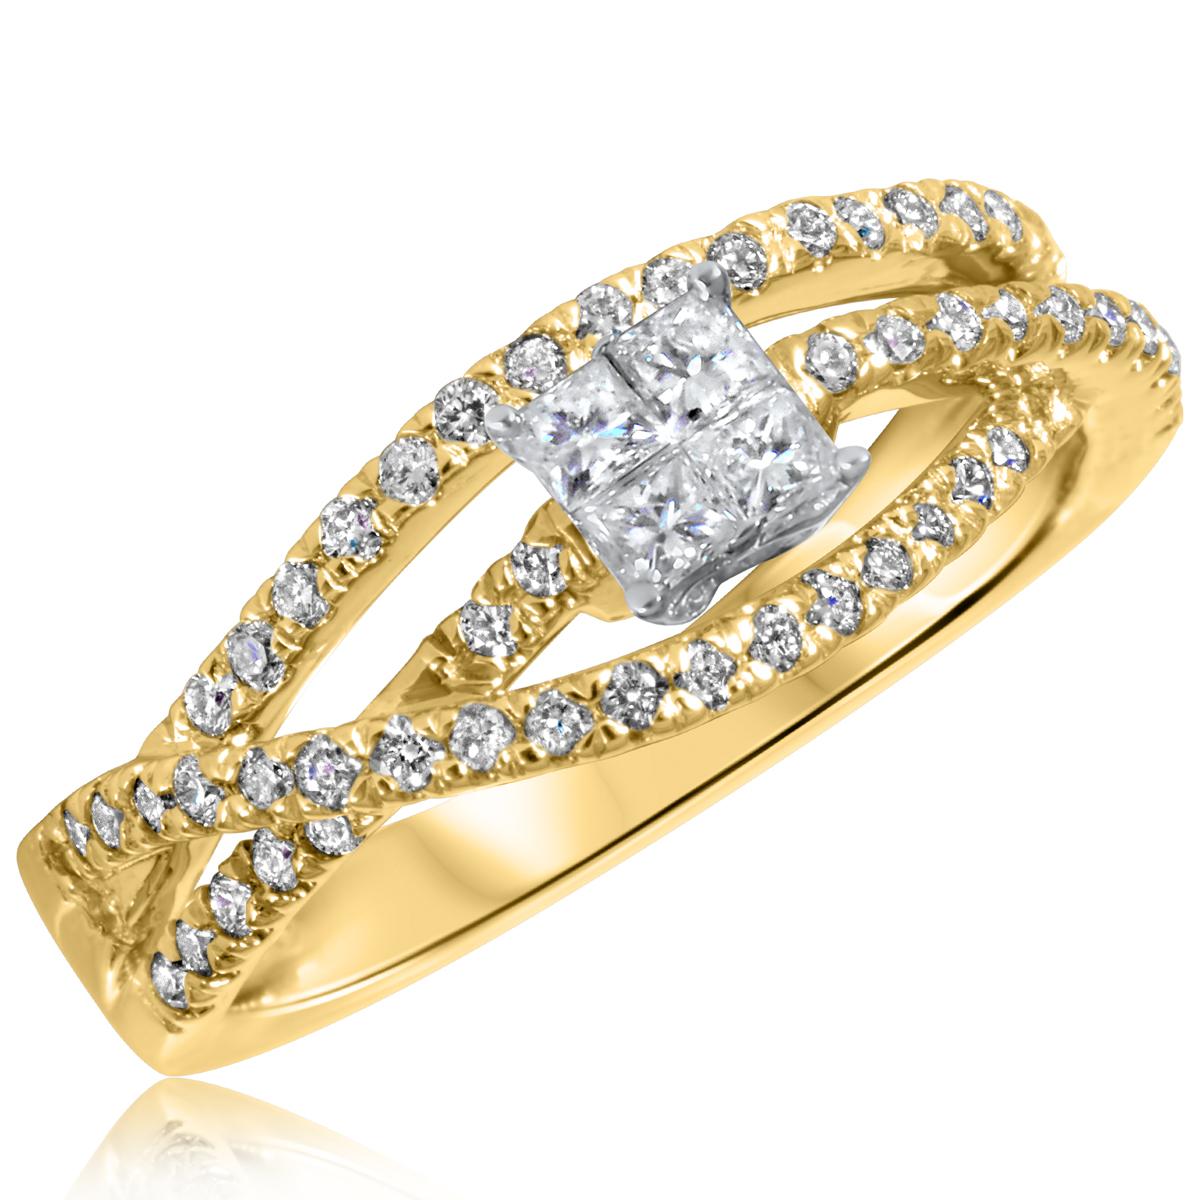 1/2 CT. T.W. Diamond Ladies Engagement Ring 14K Yellow Gold- Size 8